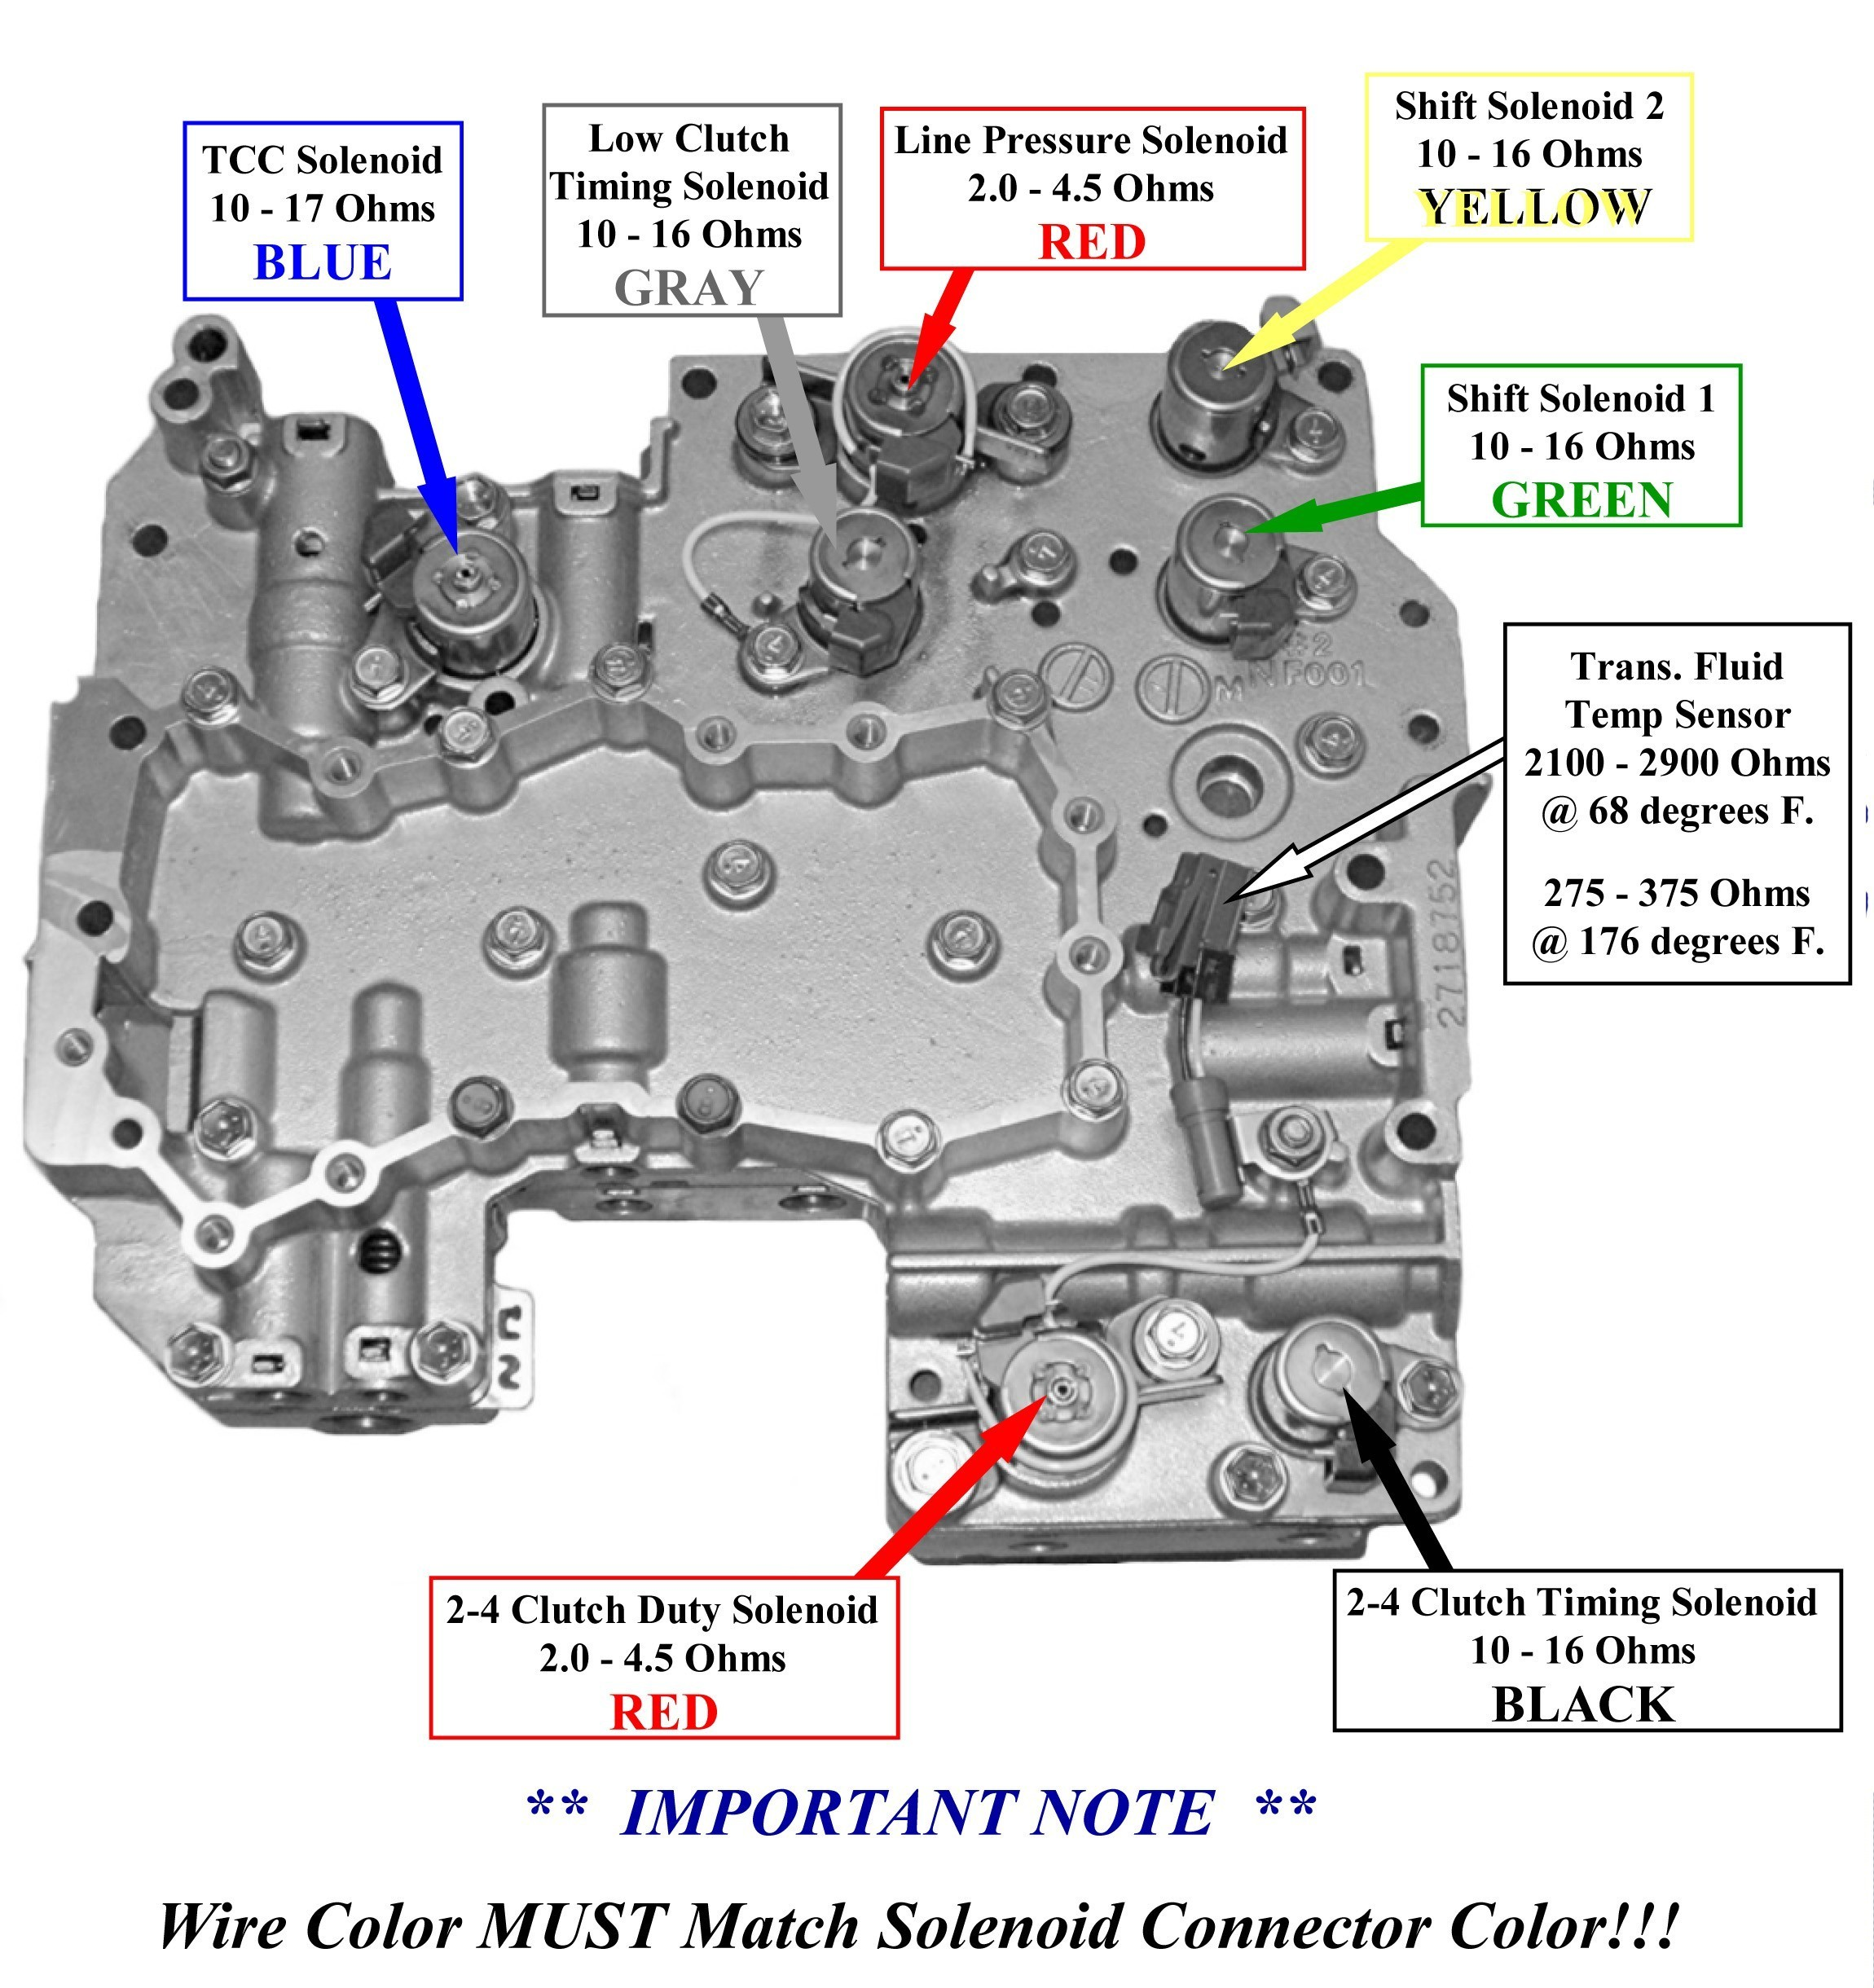 2001 Subaru Outback Engine Diagram 2001 Subaru Outback Parts Diagram 2002 Subaru Outback Parts Diagram Of 2001 Subaru Outback Engine Diagram